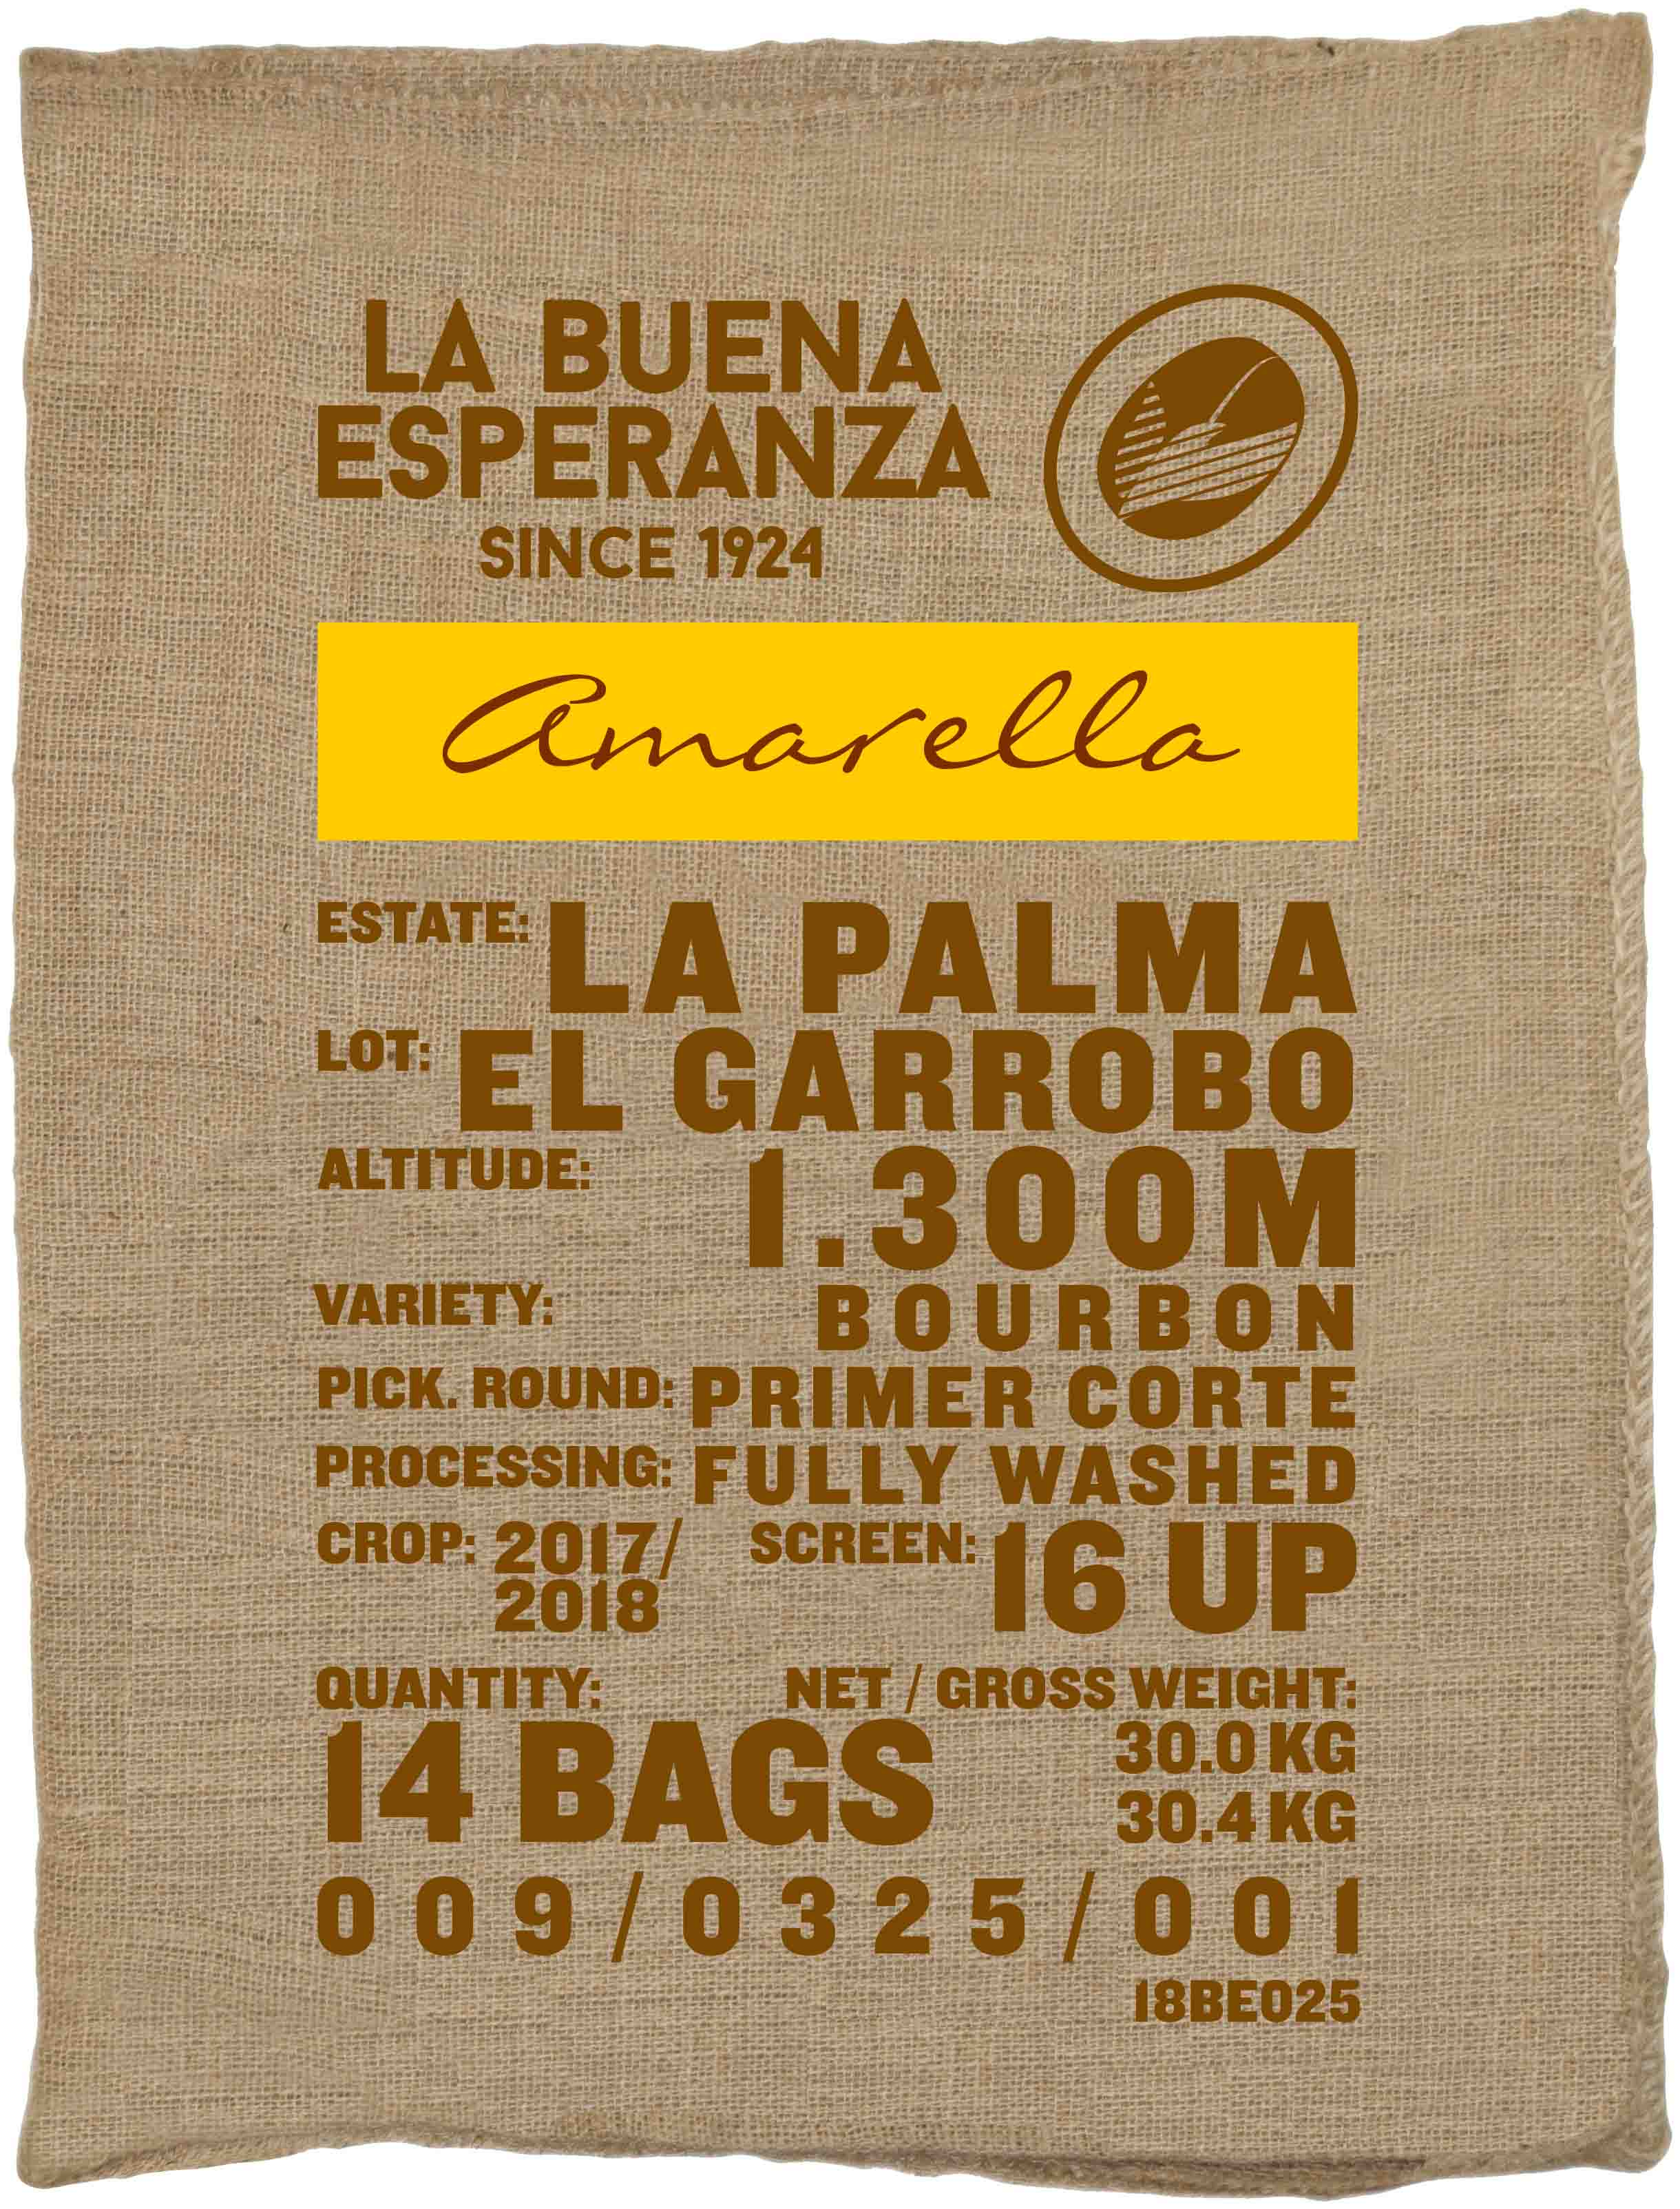 Ein Rohkaffeesack amarella Parzellenkaffee Varietät Bourbon. Finca La Buena Esperanza Lot El Garrobo.